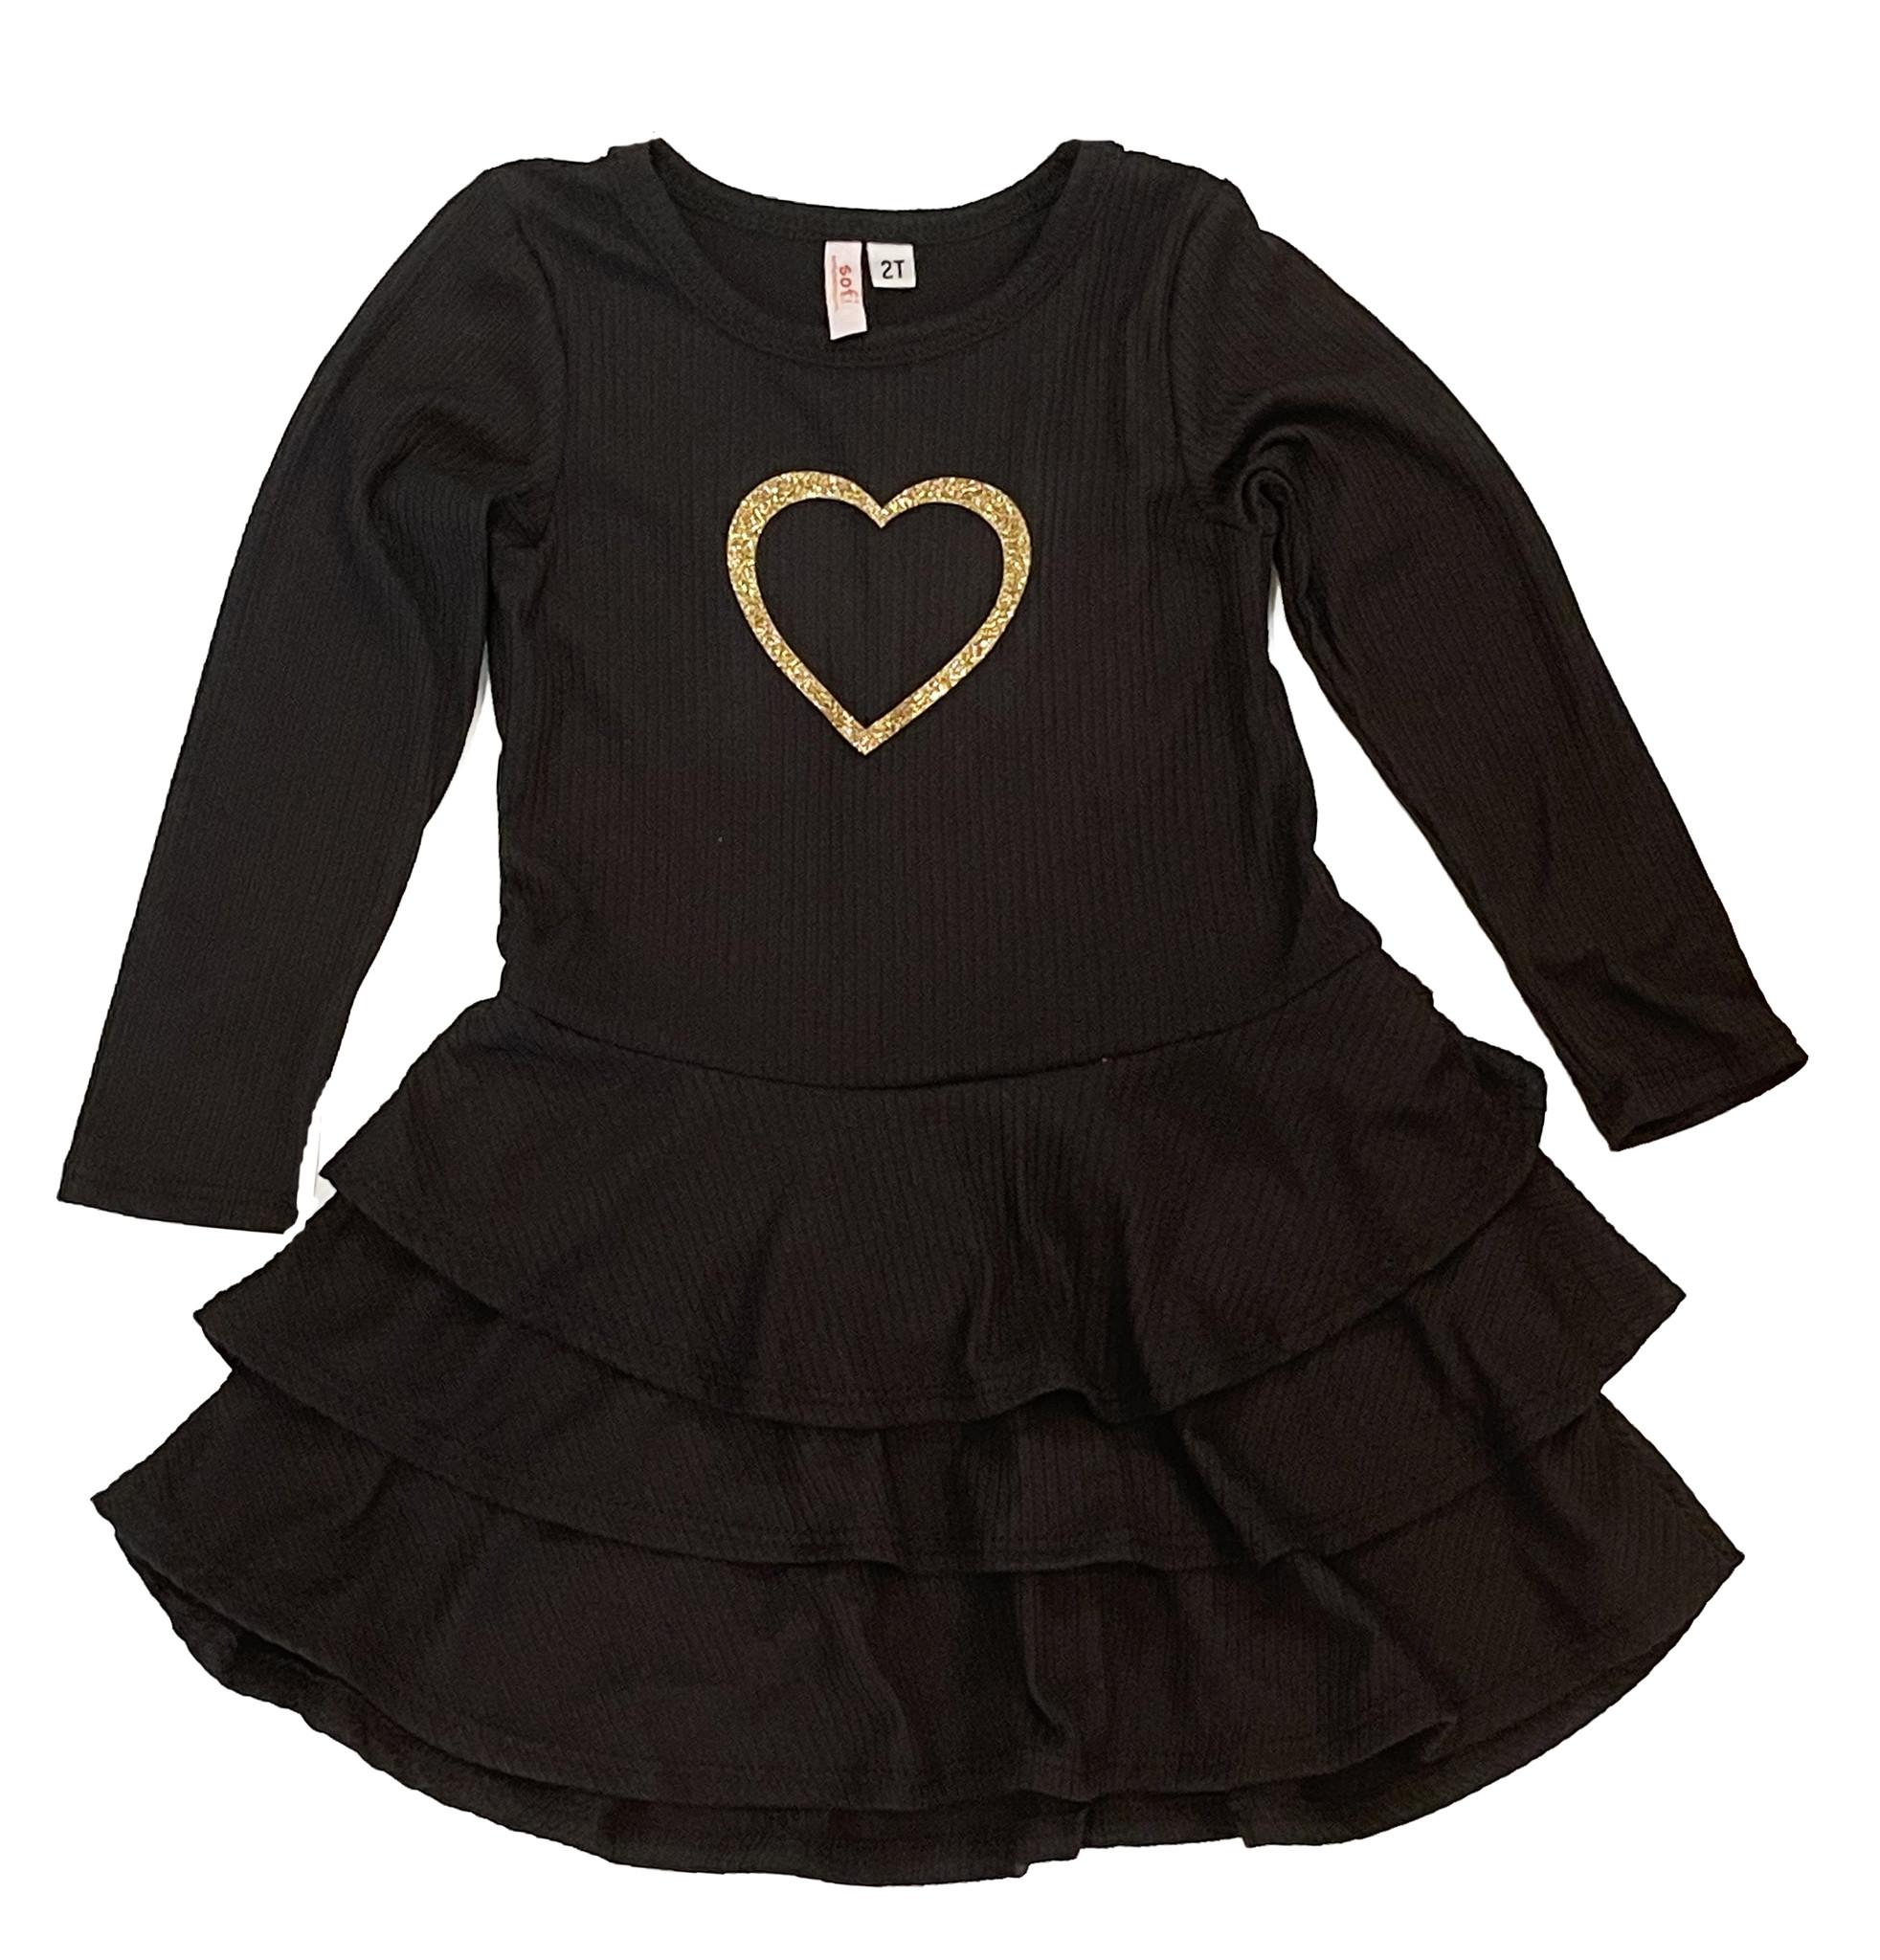 Sofi Black/Gold Heart Dress - Infant